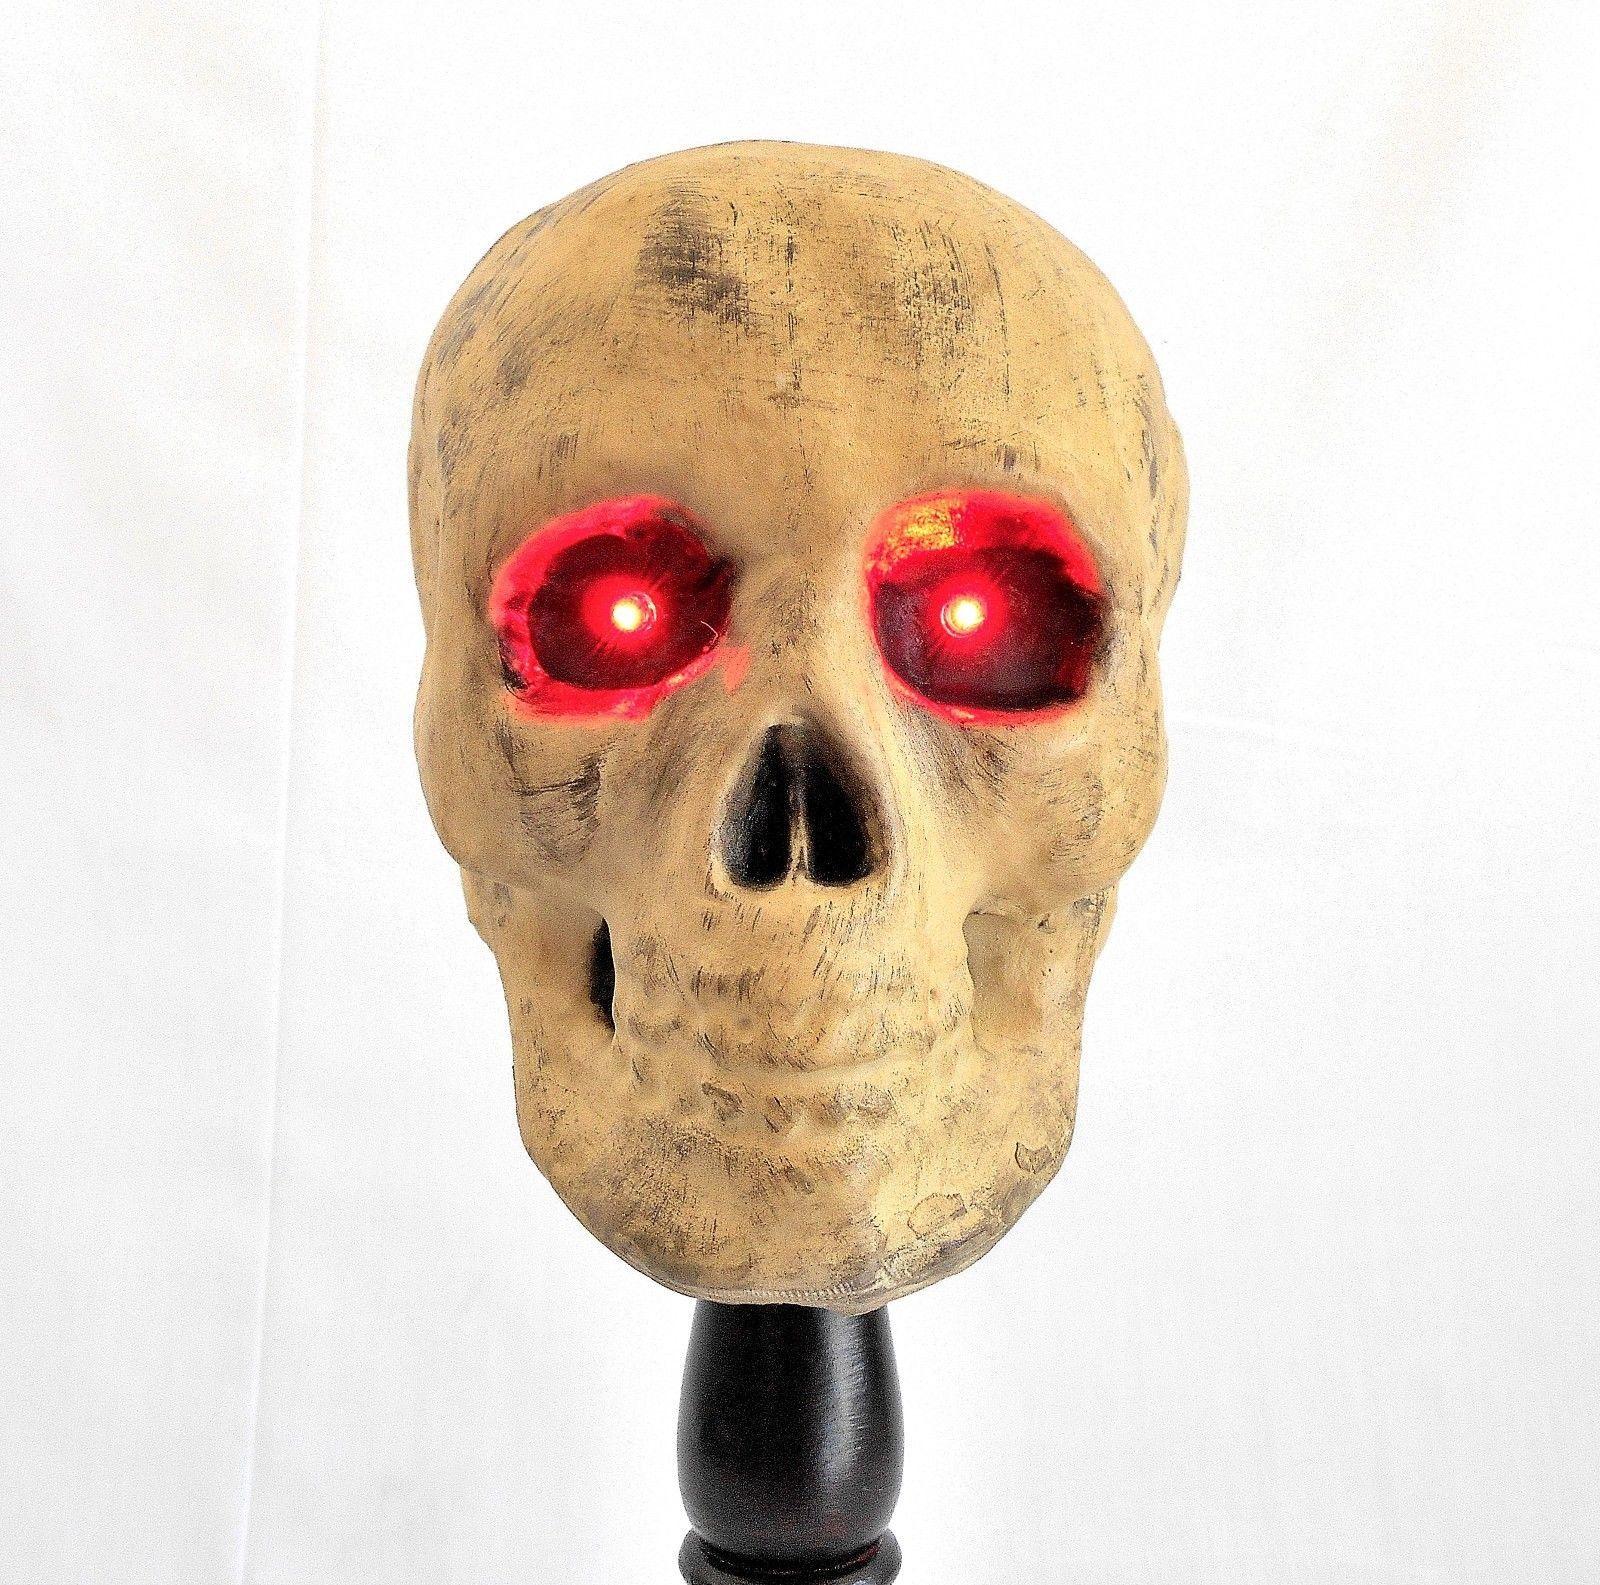 Human Skull w/Glowing Red Eyes on Wooden Pedestal - Halloween Lamp!